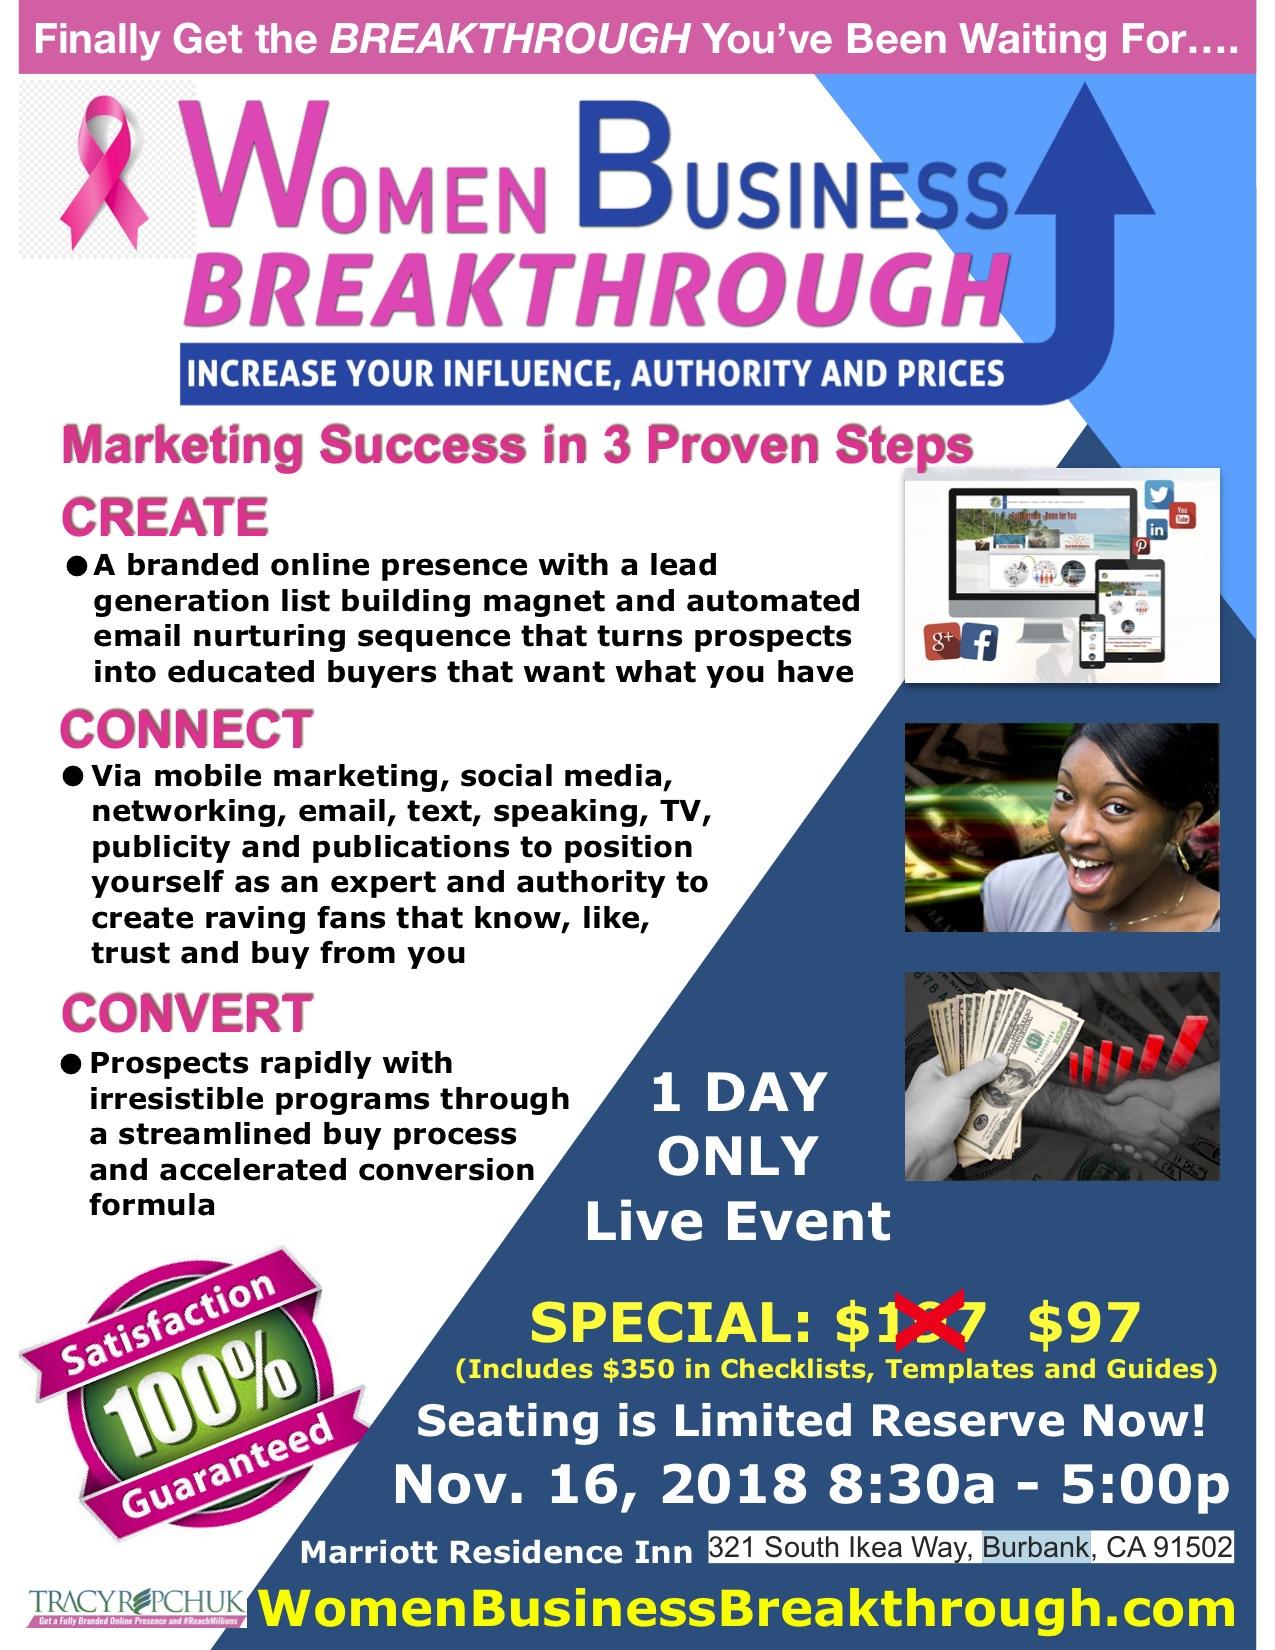 Women Business Breakthrough